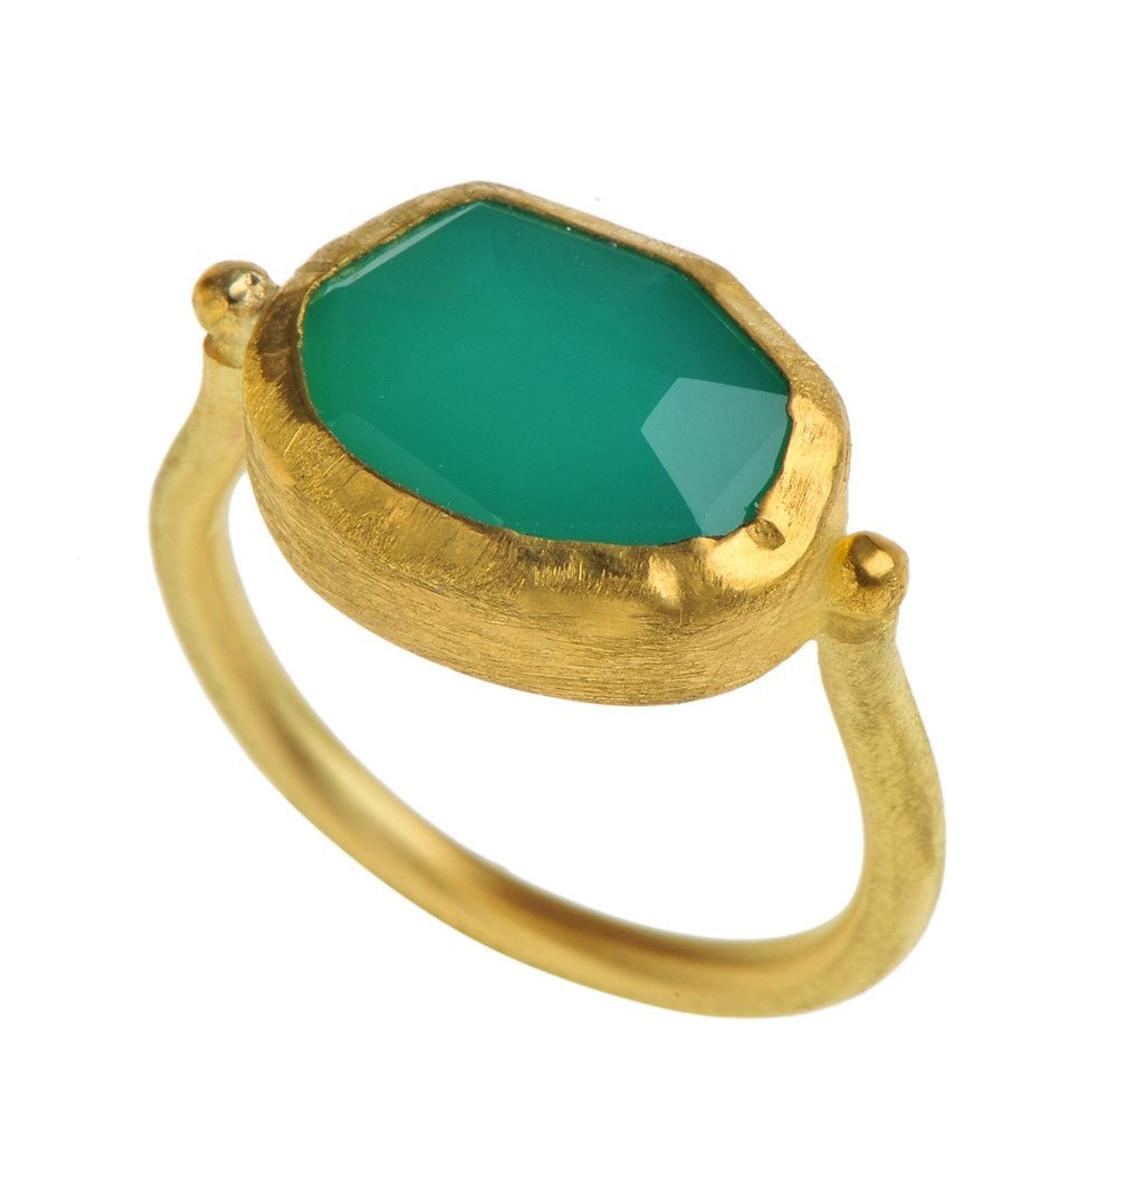 Chrysophase Gold Ring by Nava Zahavi - New Arrival